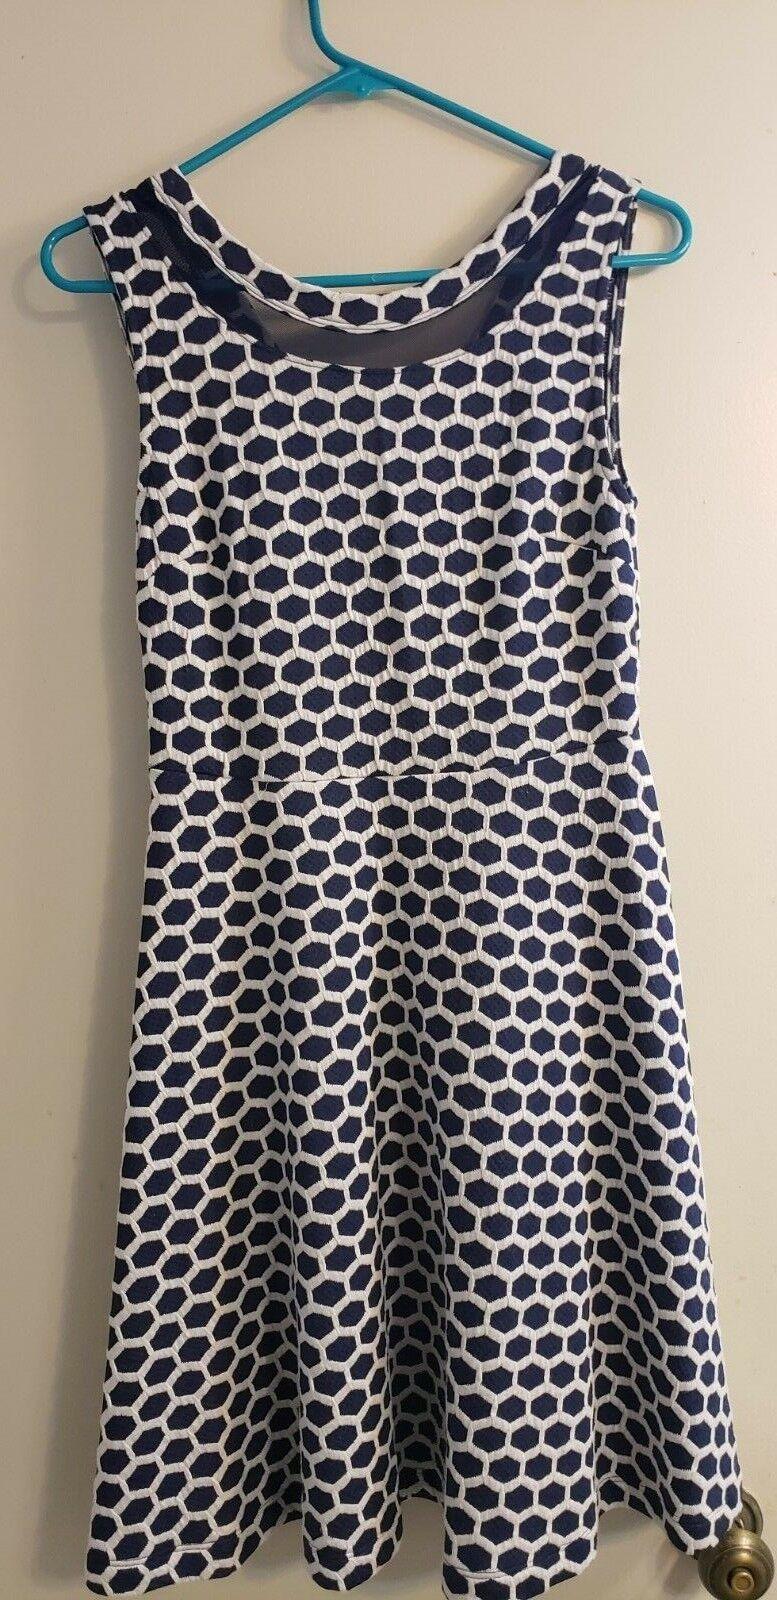 Pixley Millie  textured knit dress - image 4